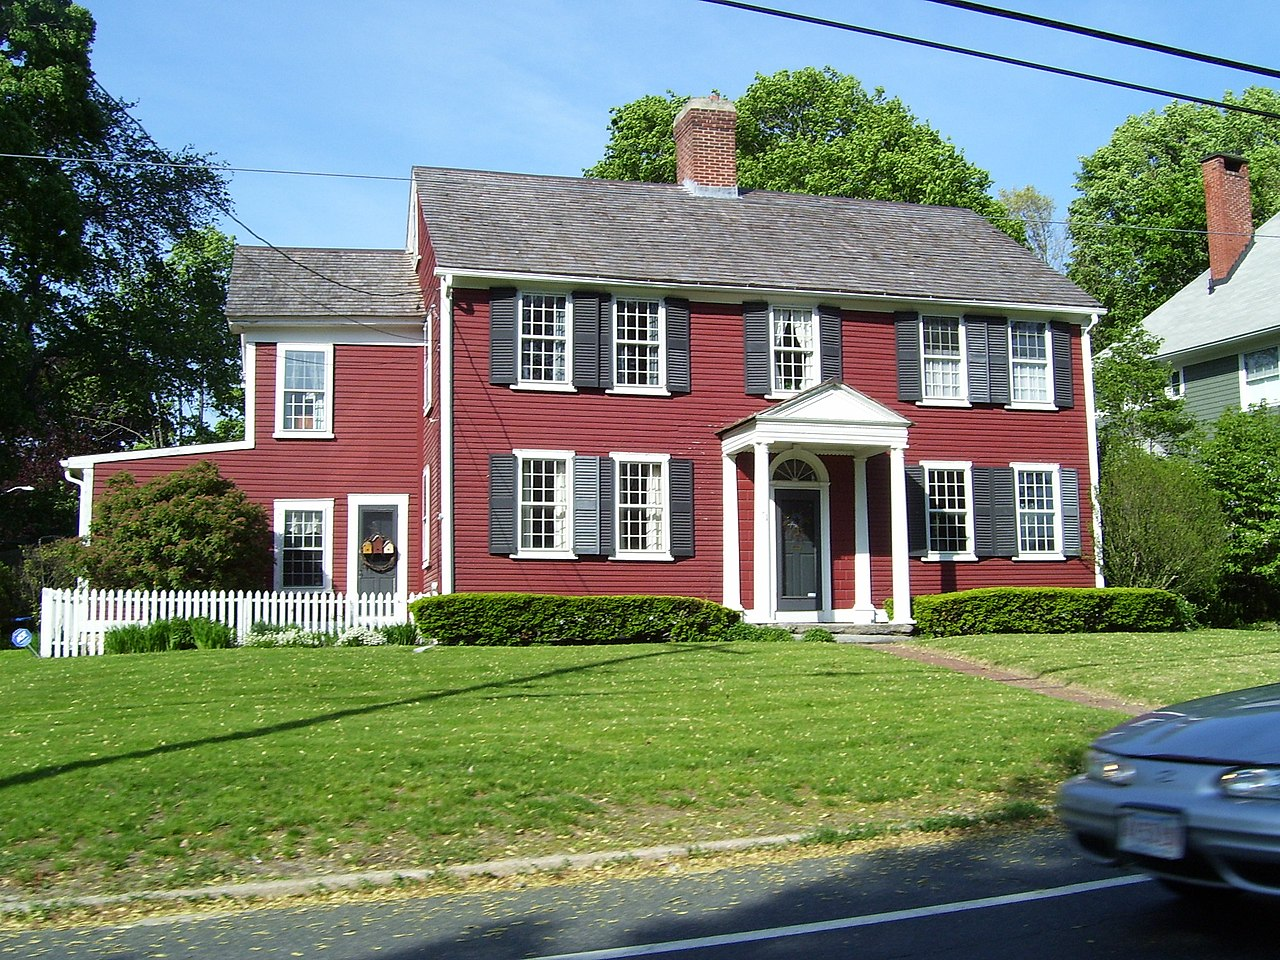 File:Union Village House RI.JPG - Wikimedia Commonsunion village